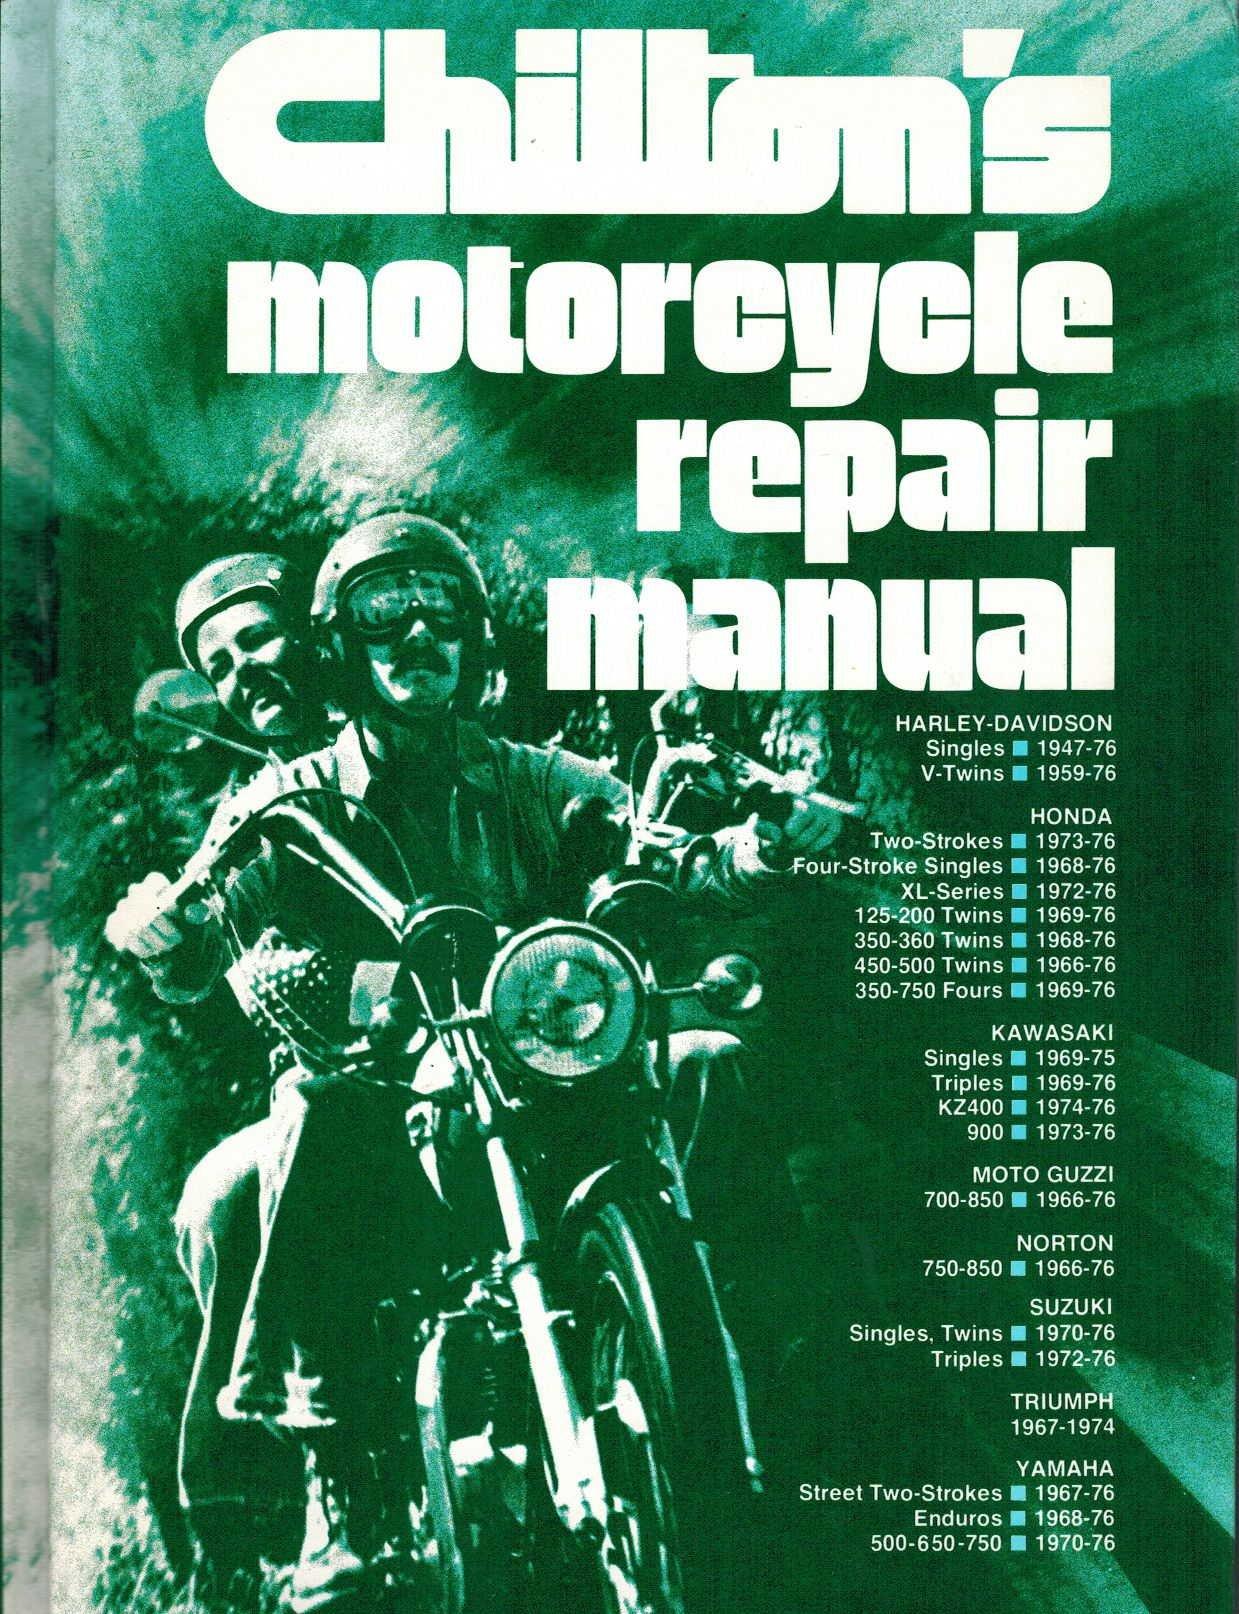 Chilton's Motorcycle Repair Manual: Alan F. Turner: 9780801965098:  Amazon.com: Books